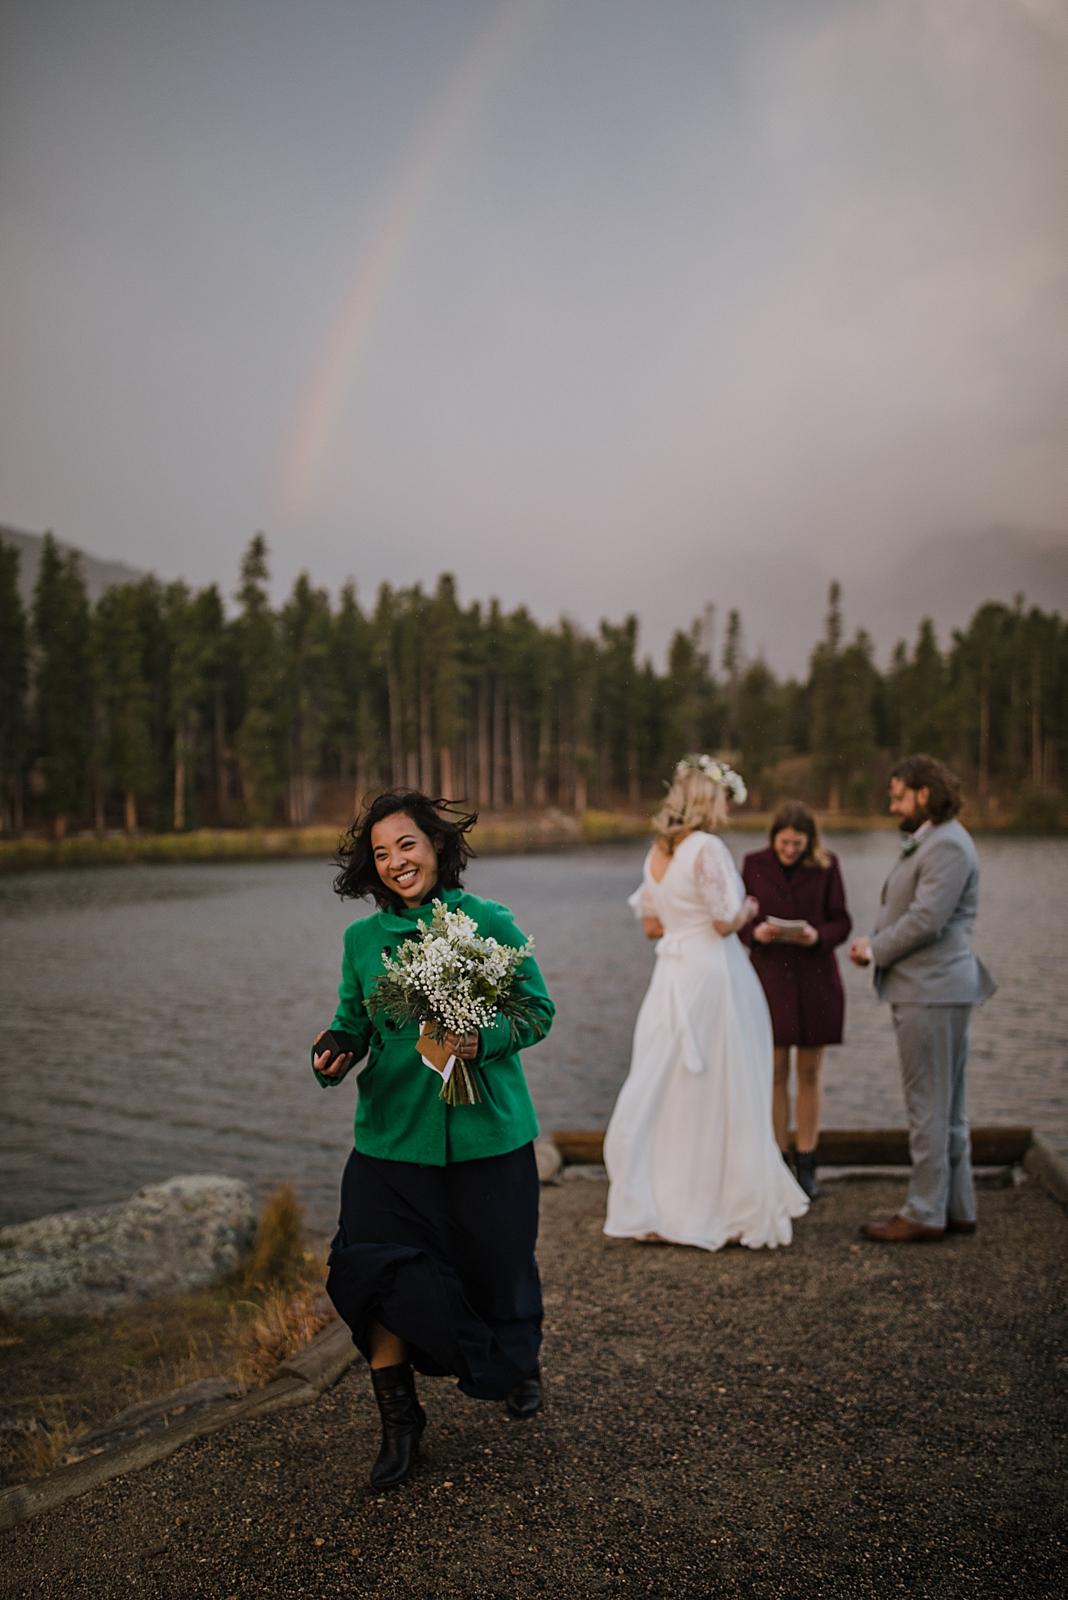 bride and groom wedding rings, sprague lake dock elopement, sunrise elopement, colorado elopement, sprague lake elopement, rocky mountain national park elopement, adventurous colorado hiking elopement